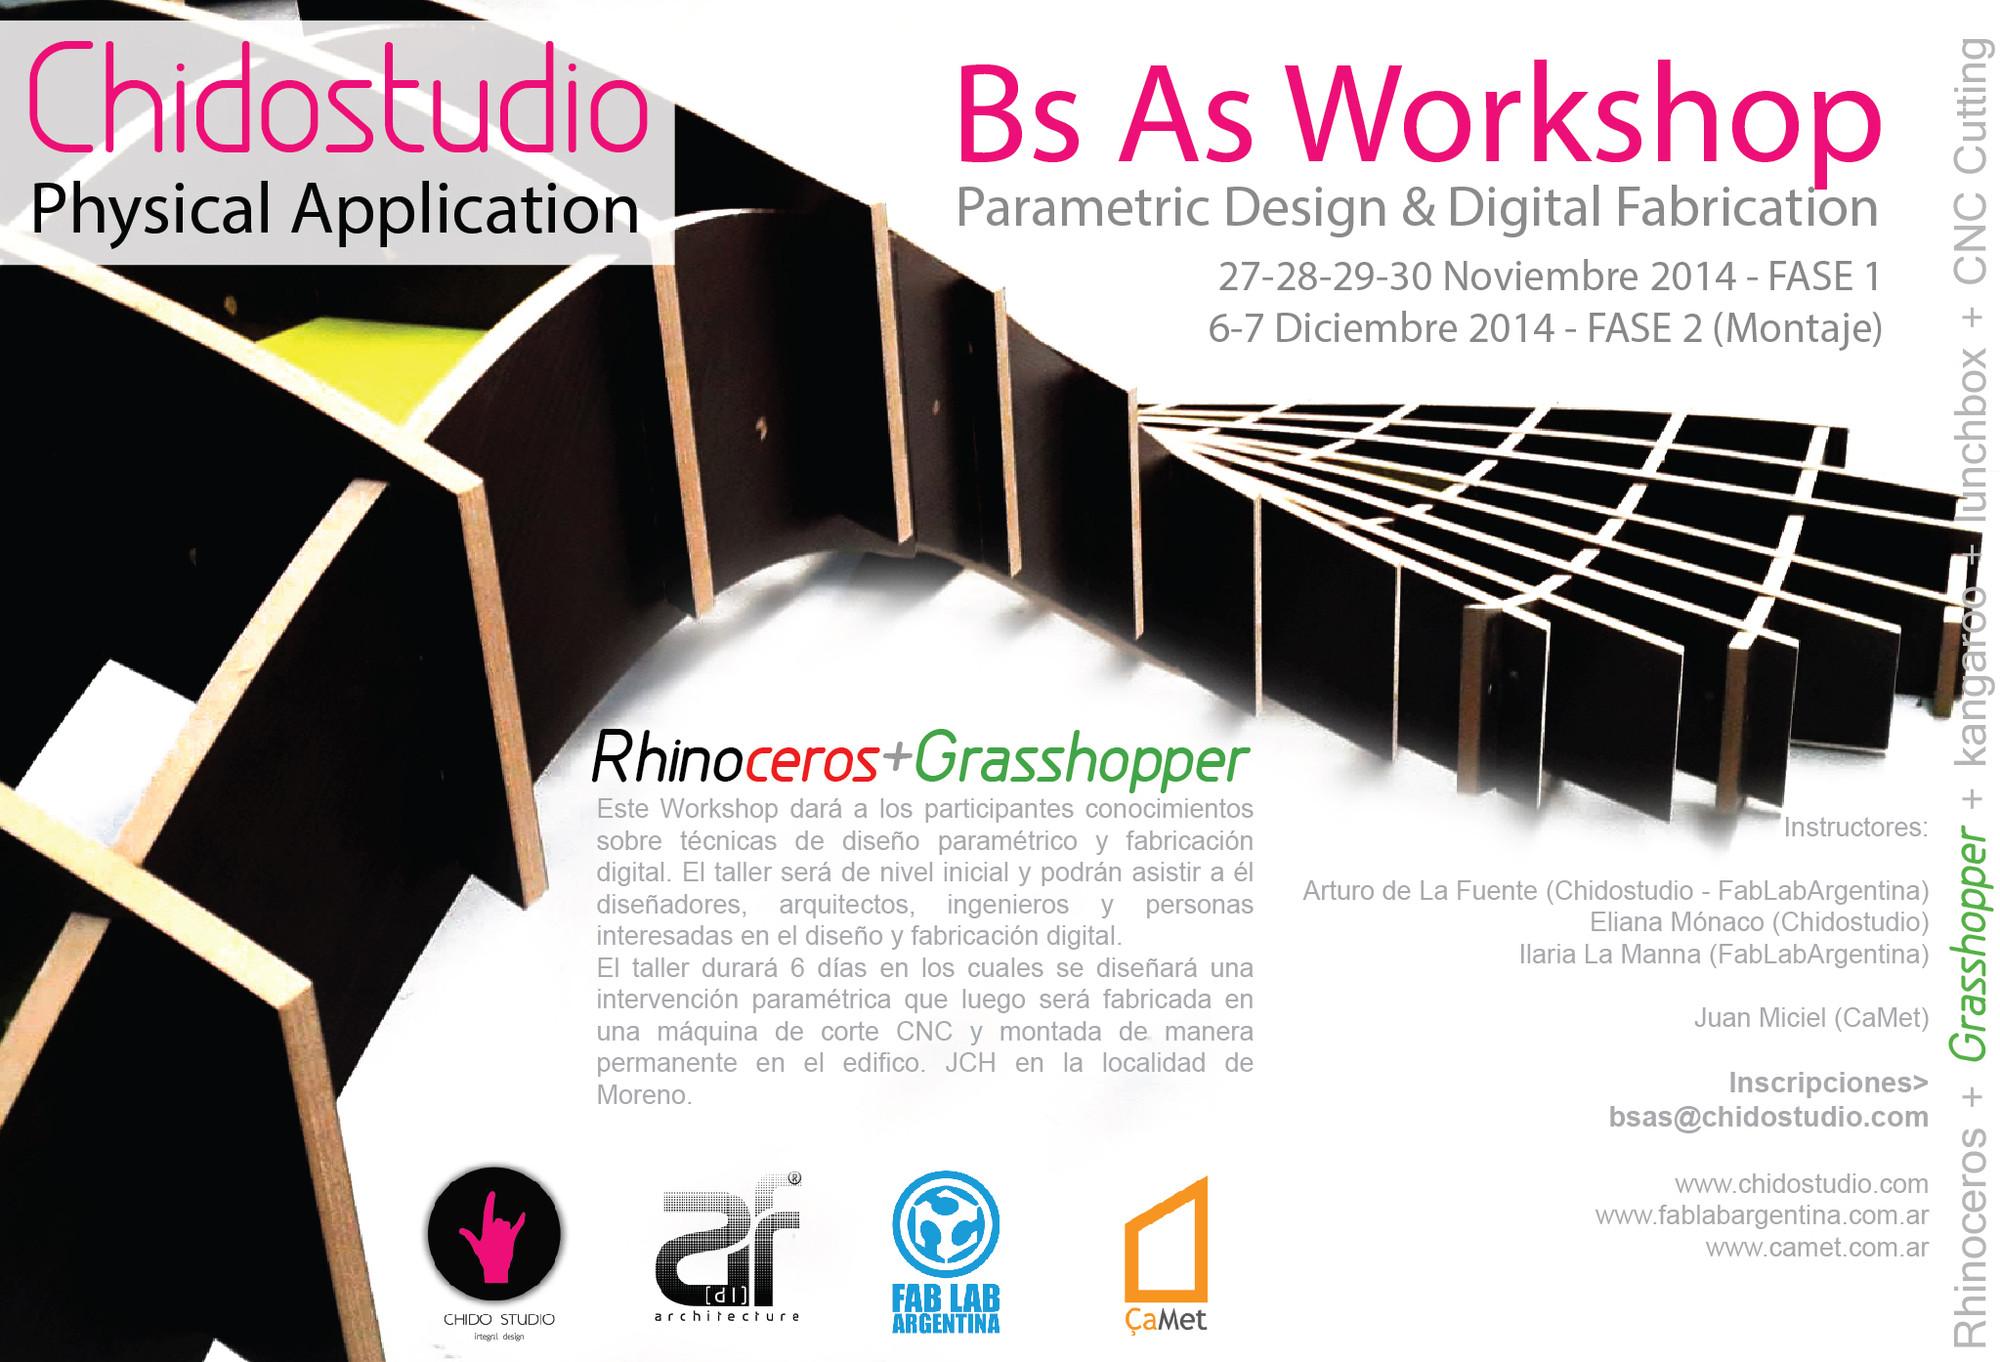 Chidostudio: Bs As Workshop Parametric Design & Digital Fabrication / ¡Sorteamos un cupo!